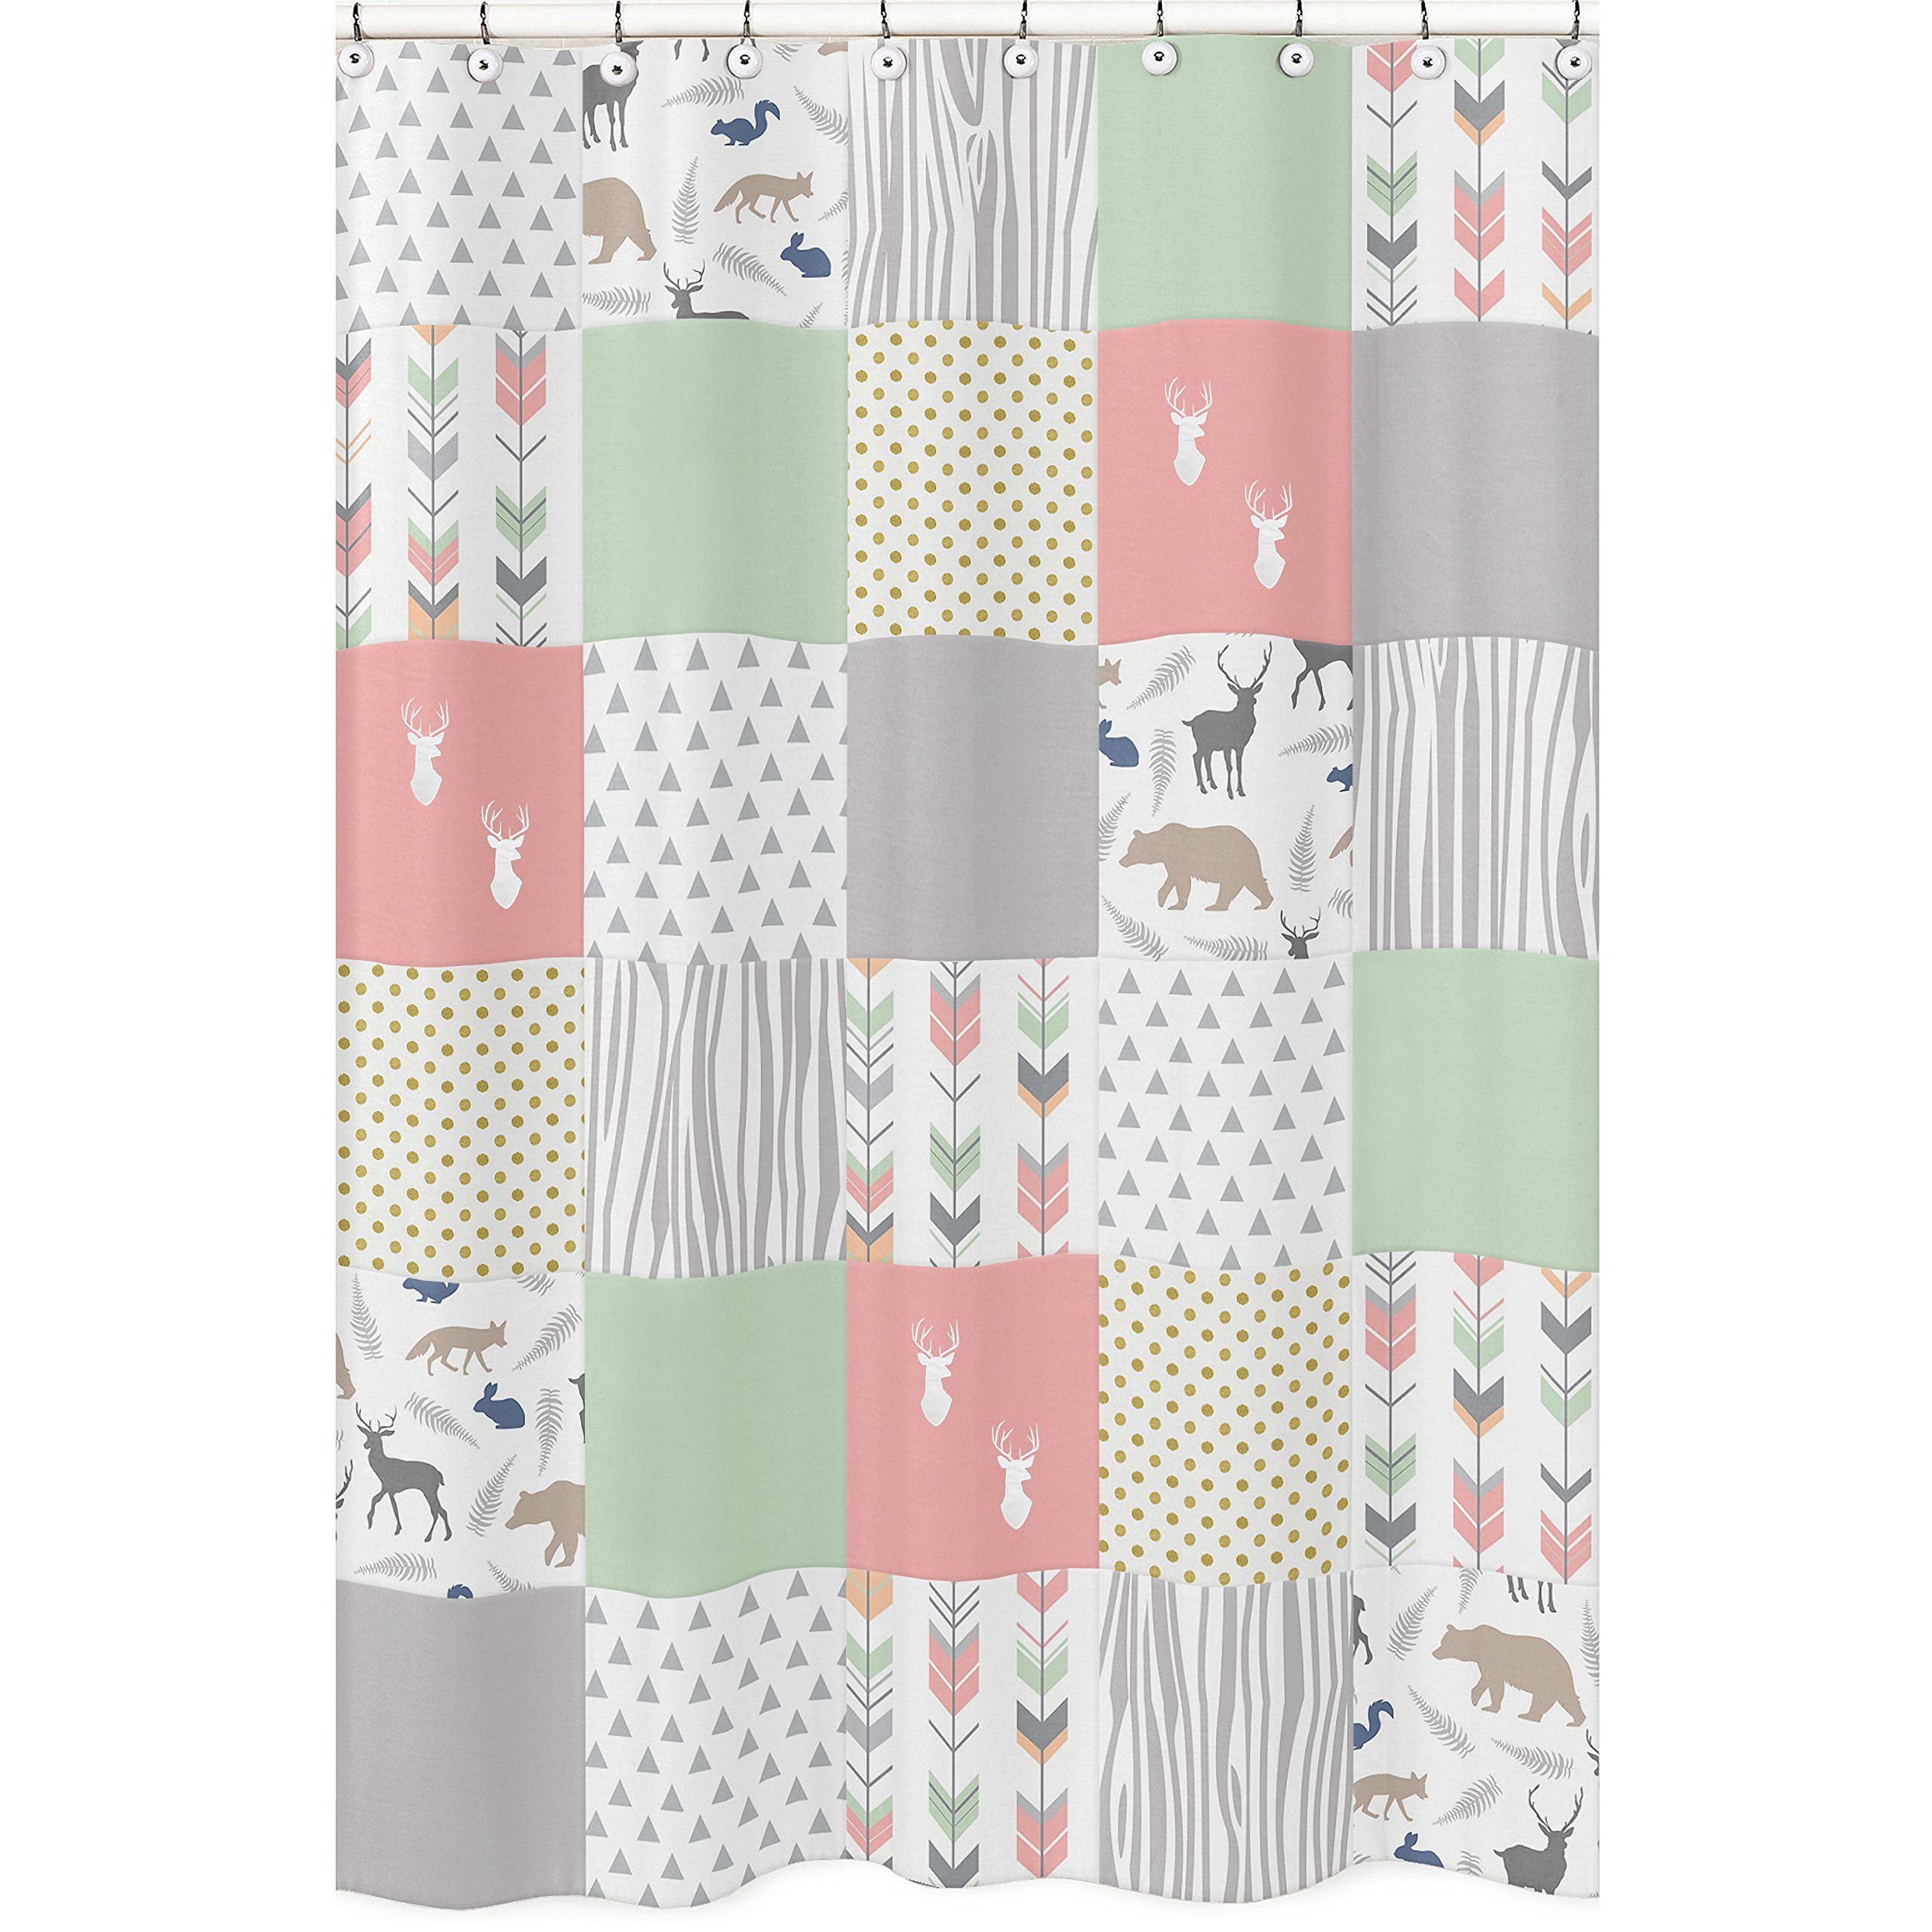 Sweet Jojo Designs Coral, Mint and Grey Woodsy Animal Polka Dot Arrow Girls Kids Bathroom Fabric Bath Shower Curtain